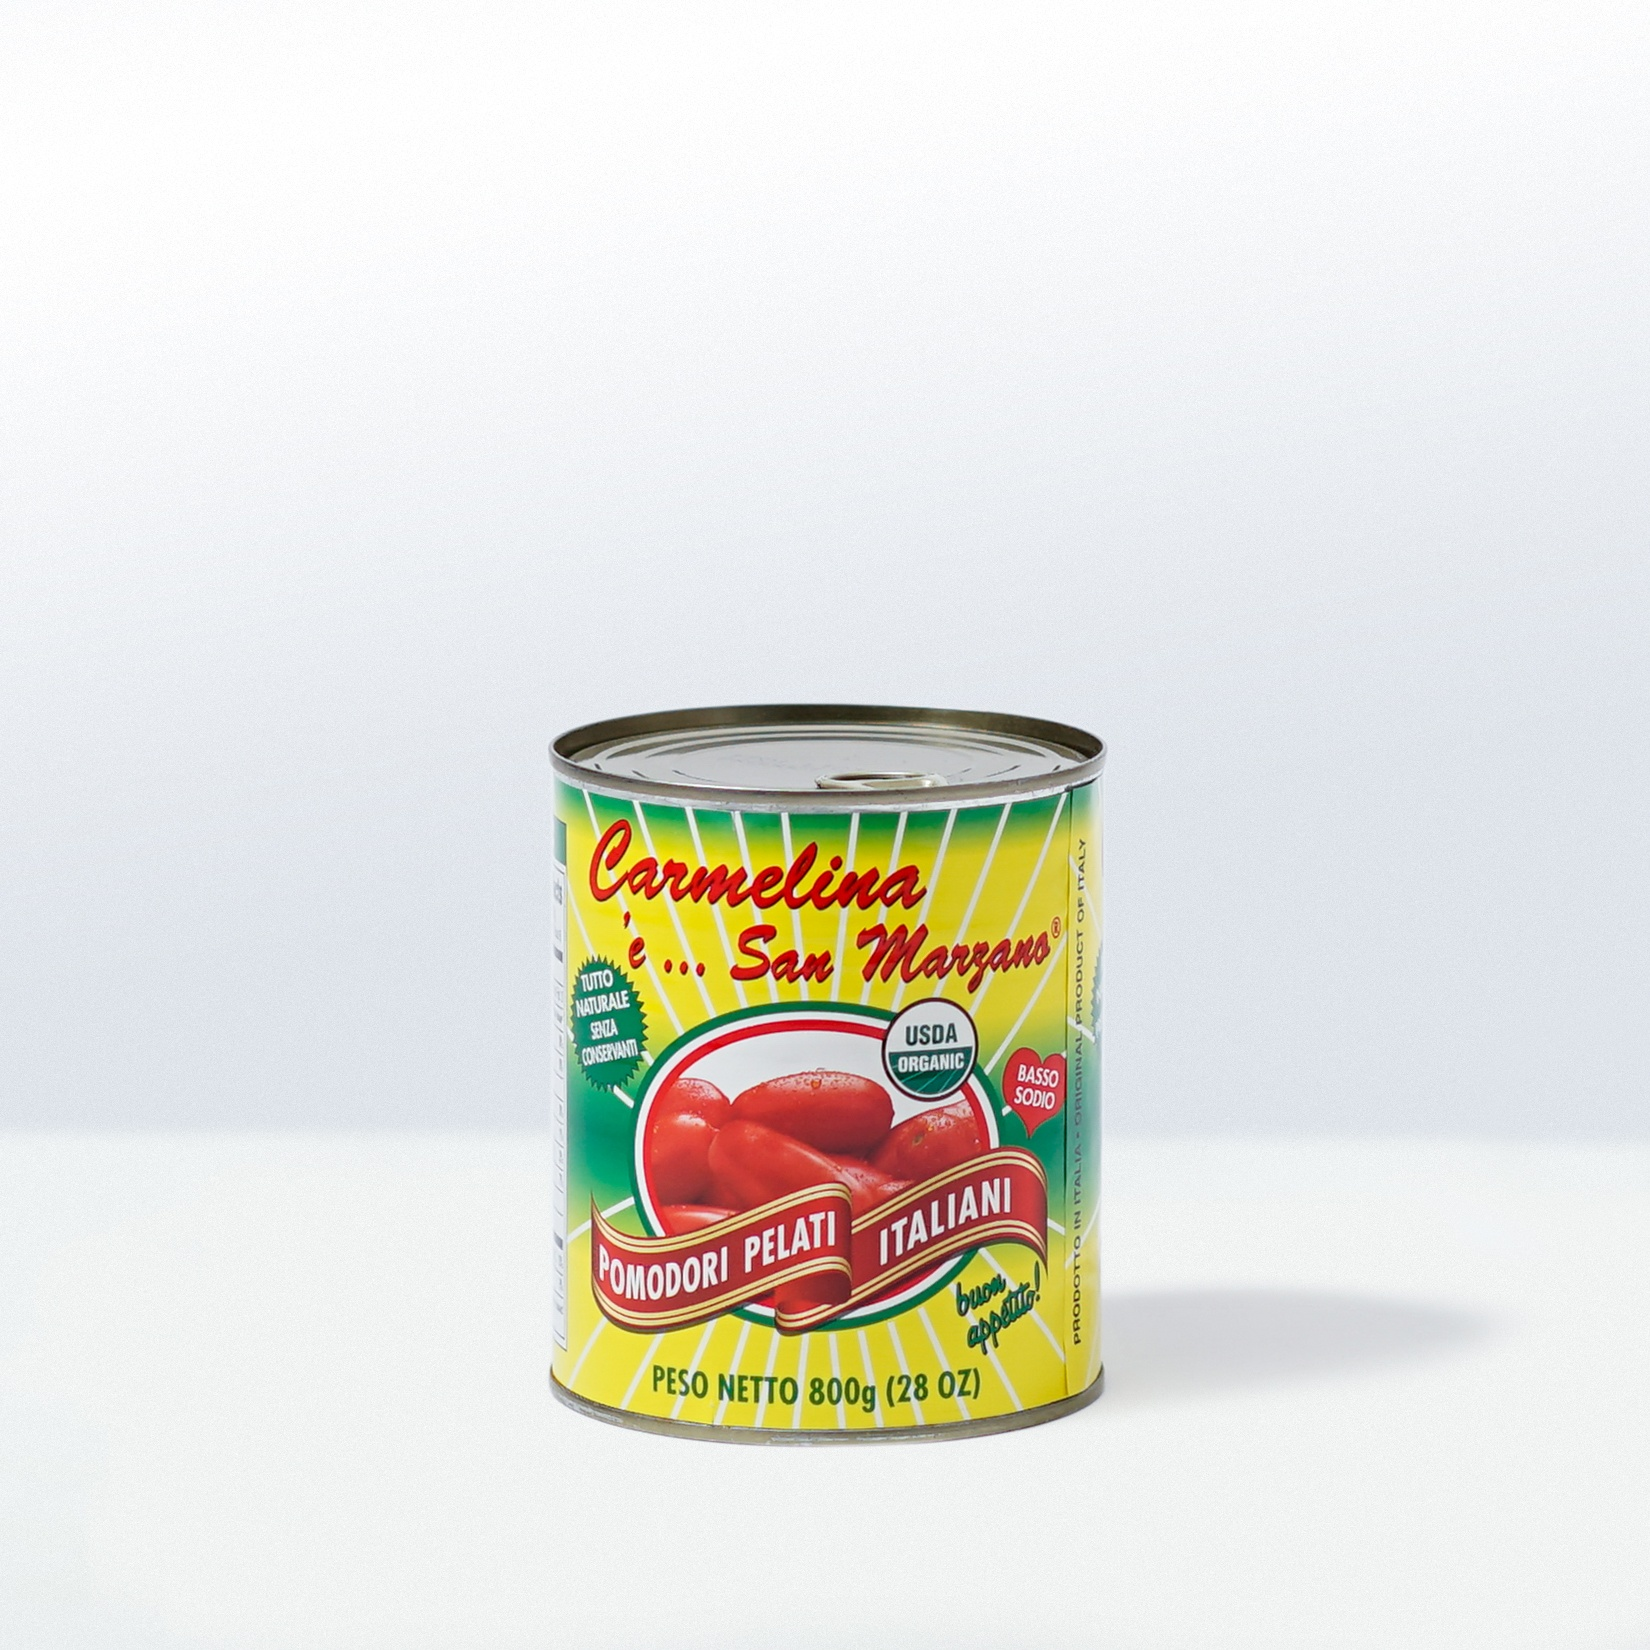 Carmelina 'e San Marzano-Organic ItalianWhole Peel Tomatoes